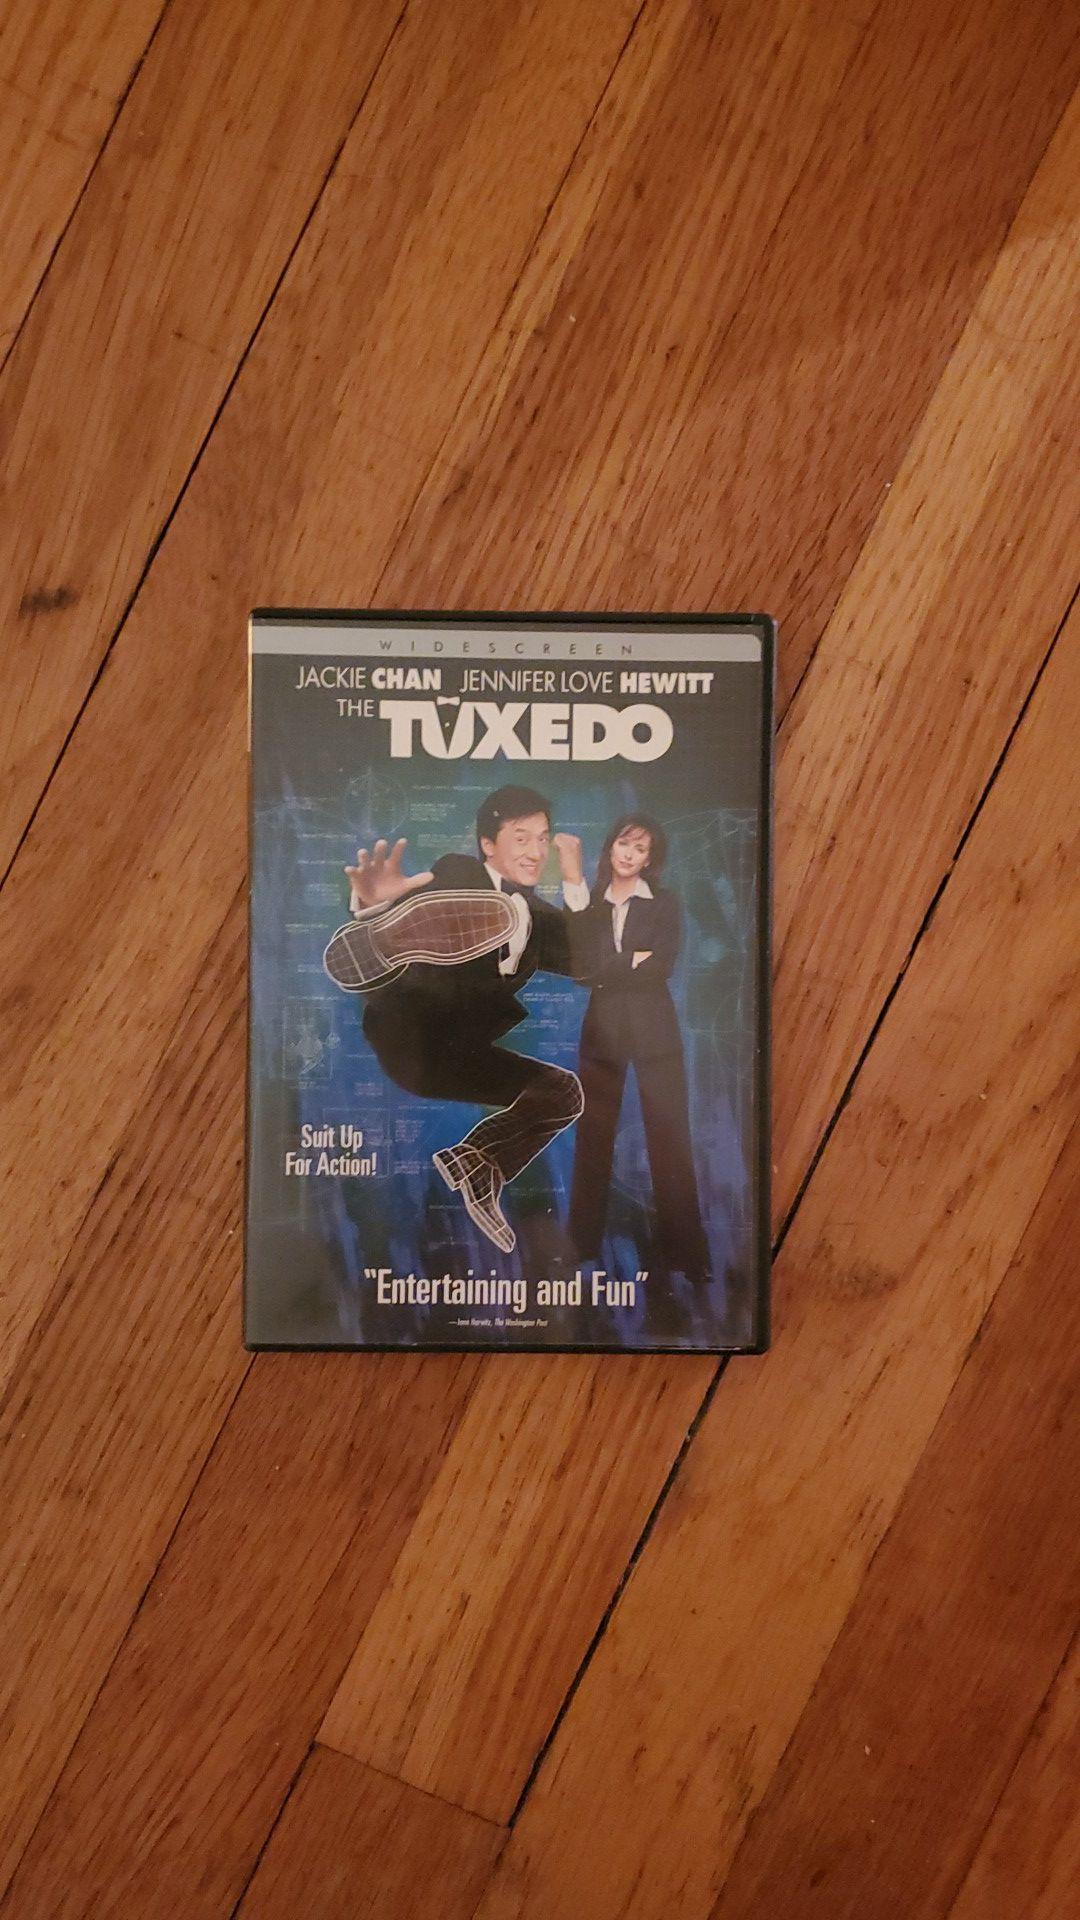 Poseidon, Shrek 2, Darkness Falls & The Tuxedo DVD (Lot of 4)